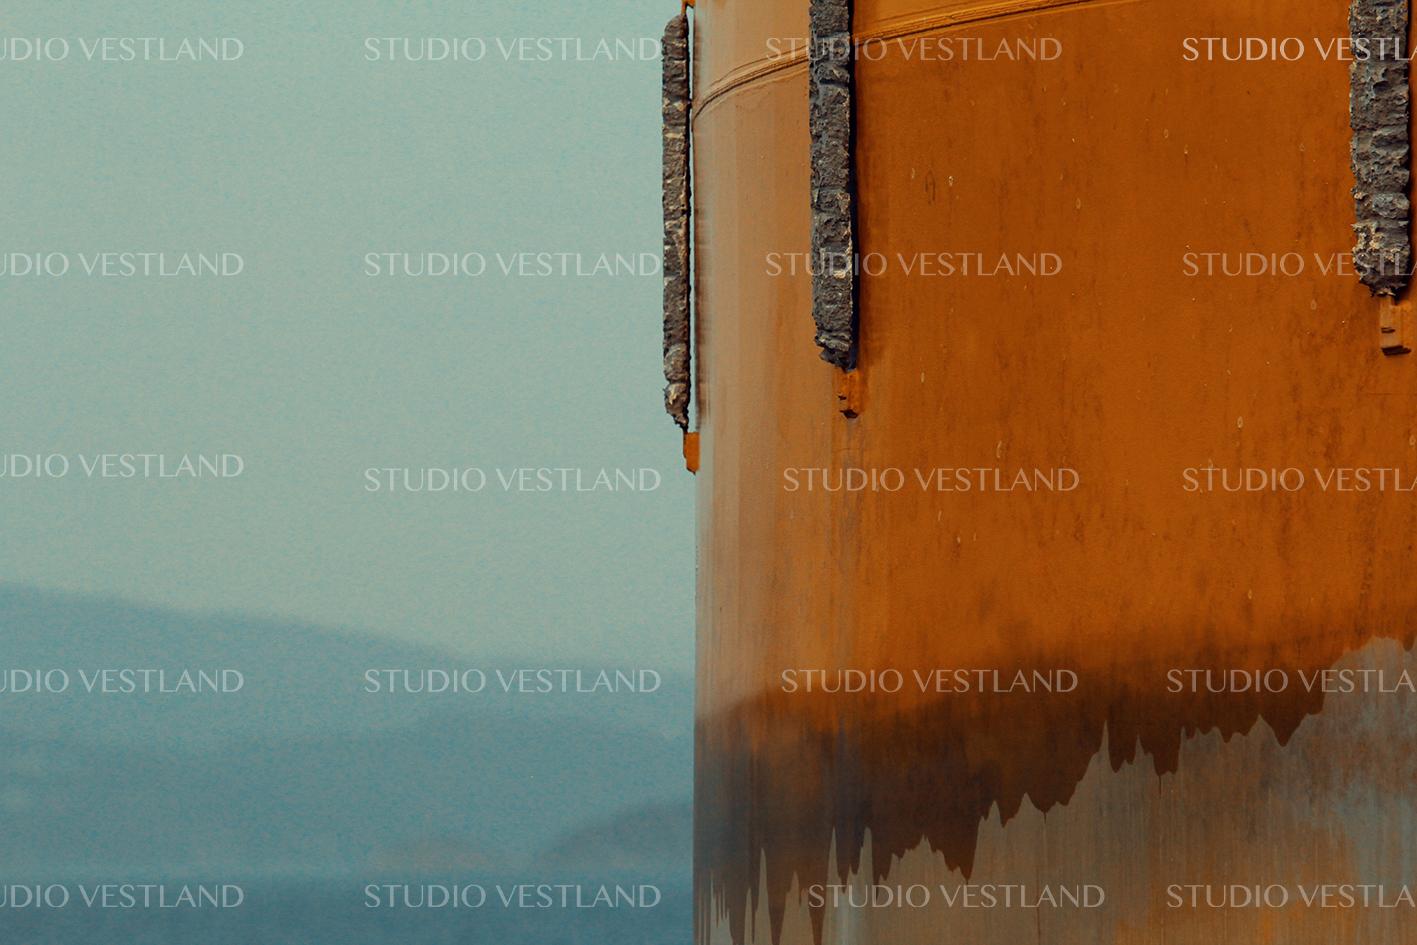 Studio Vestland - Riggfot 01